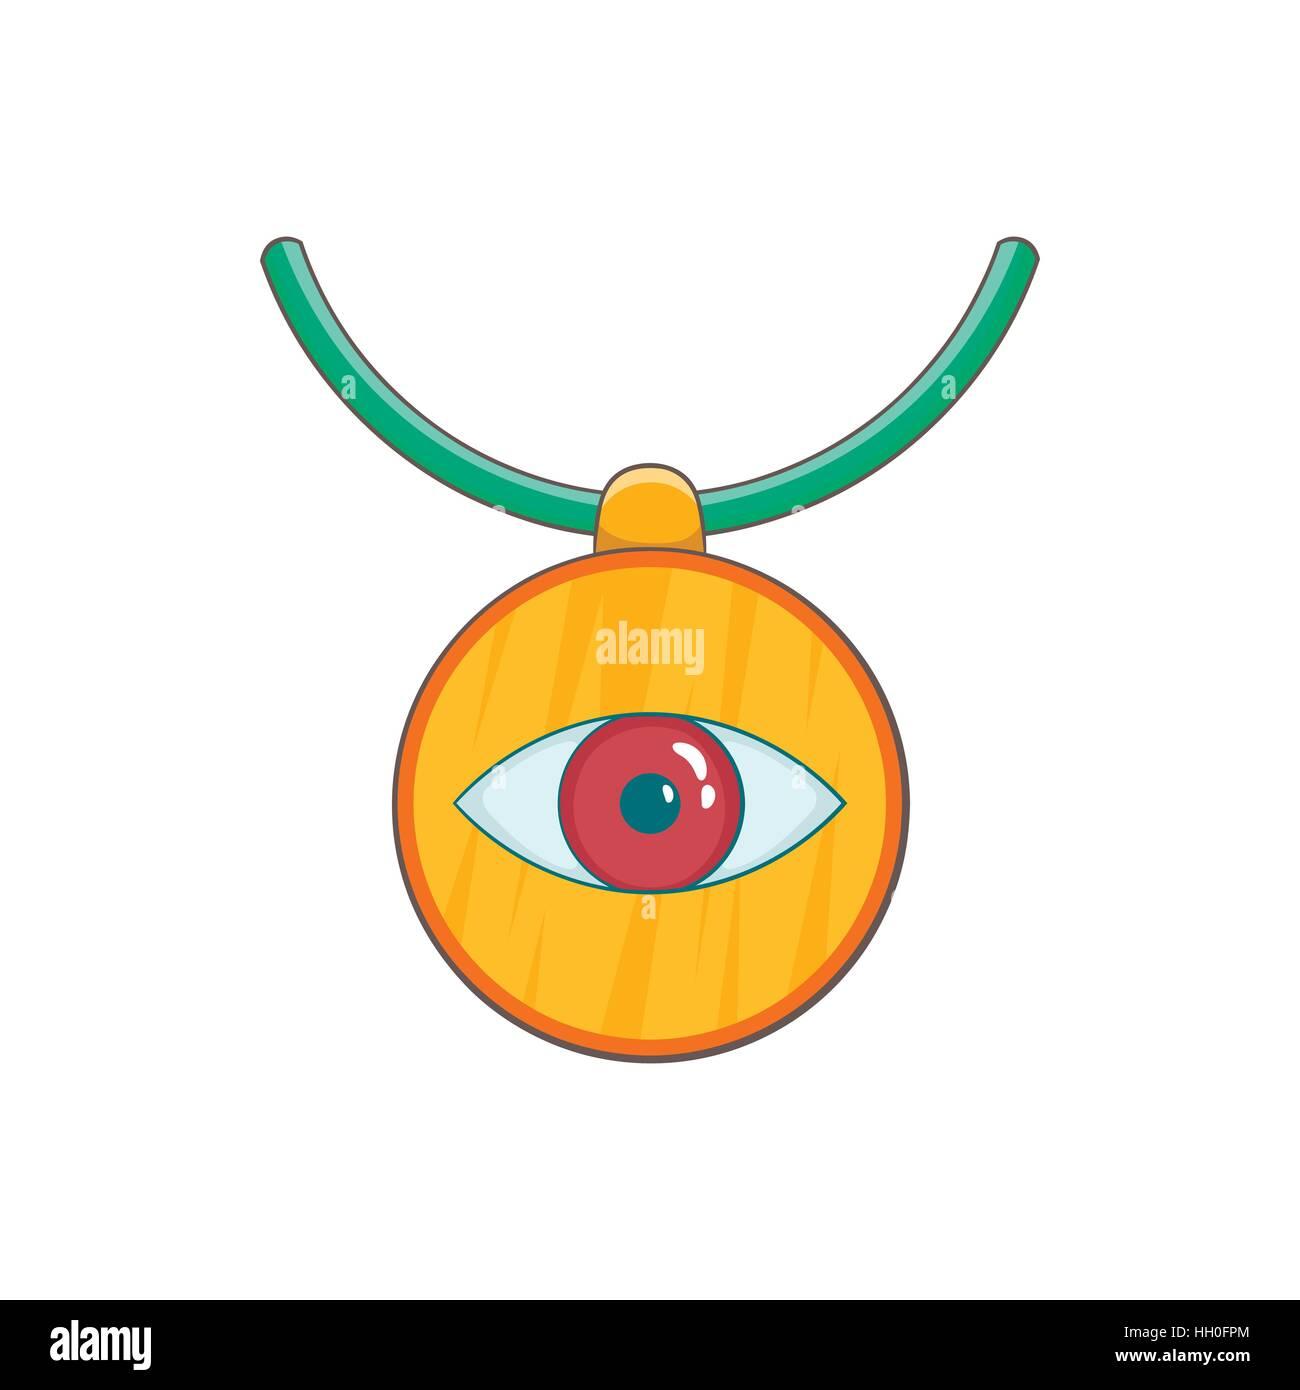 Greek evil eye vector symbol of protection stock vector art blue magic souvenir amulet against the evil eye icon cartoon style stock photo biocorpaavc